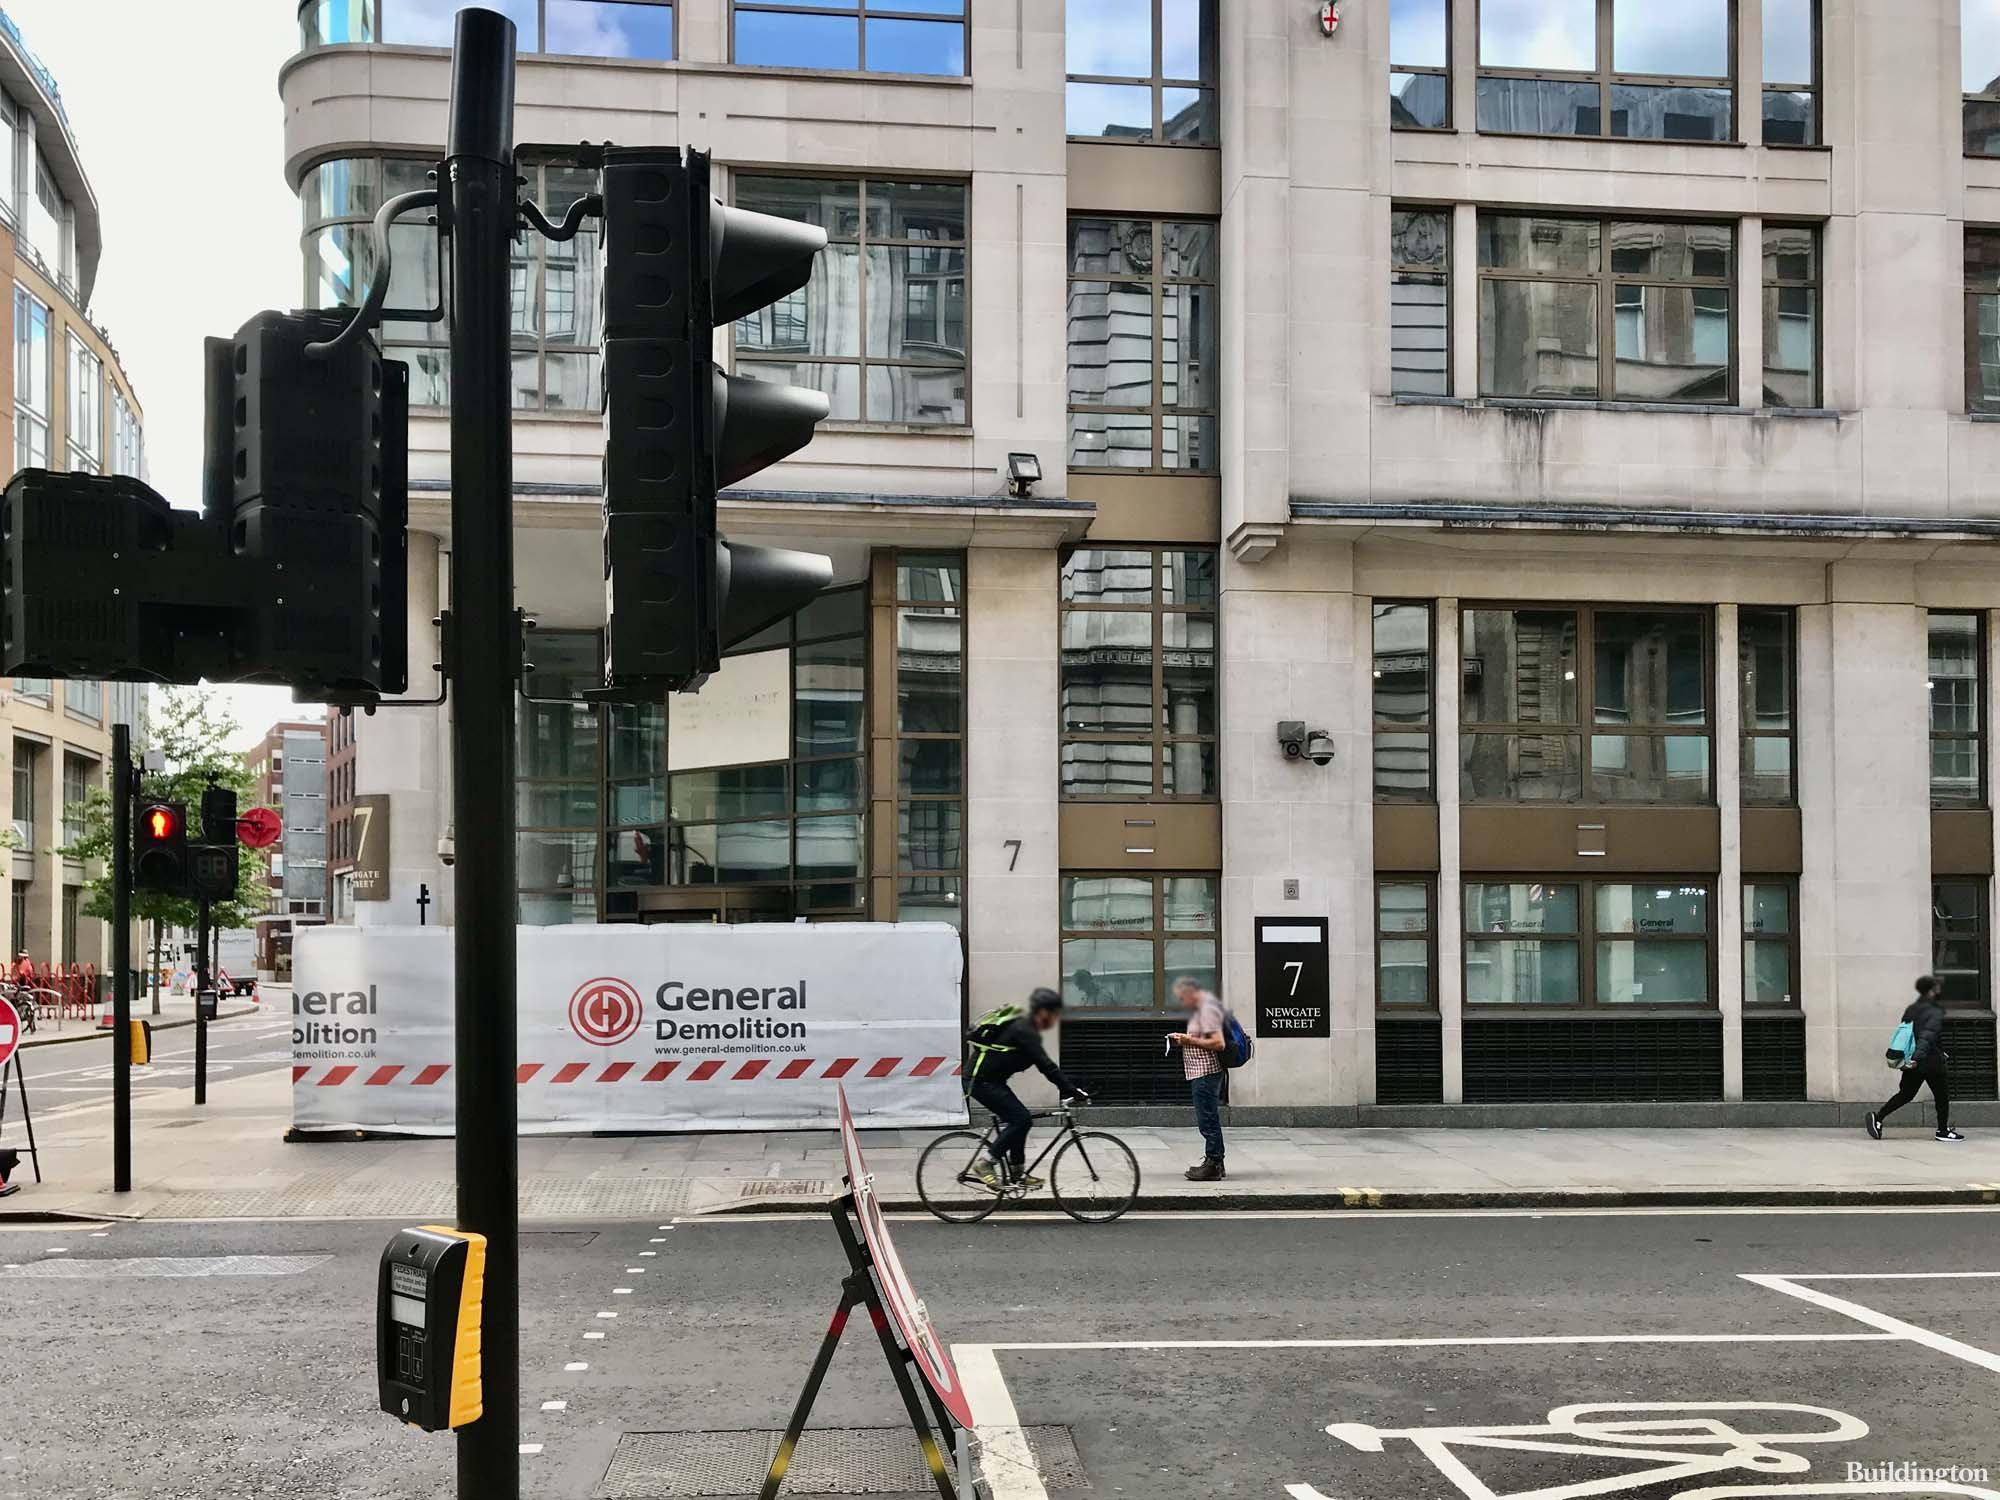 General Demolition on site at 7 Newgate Street in London EC1.